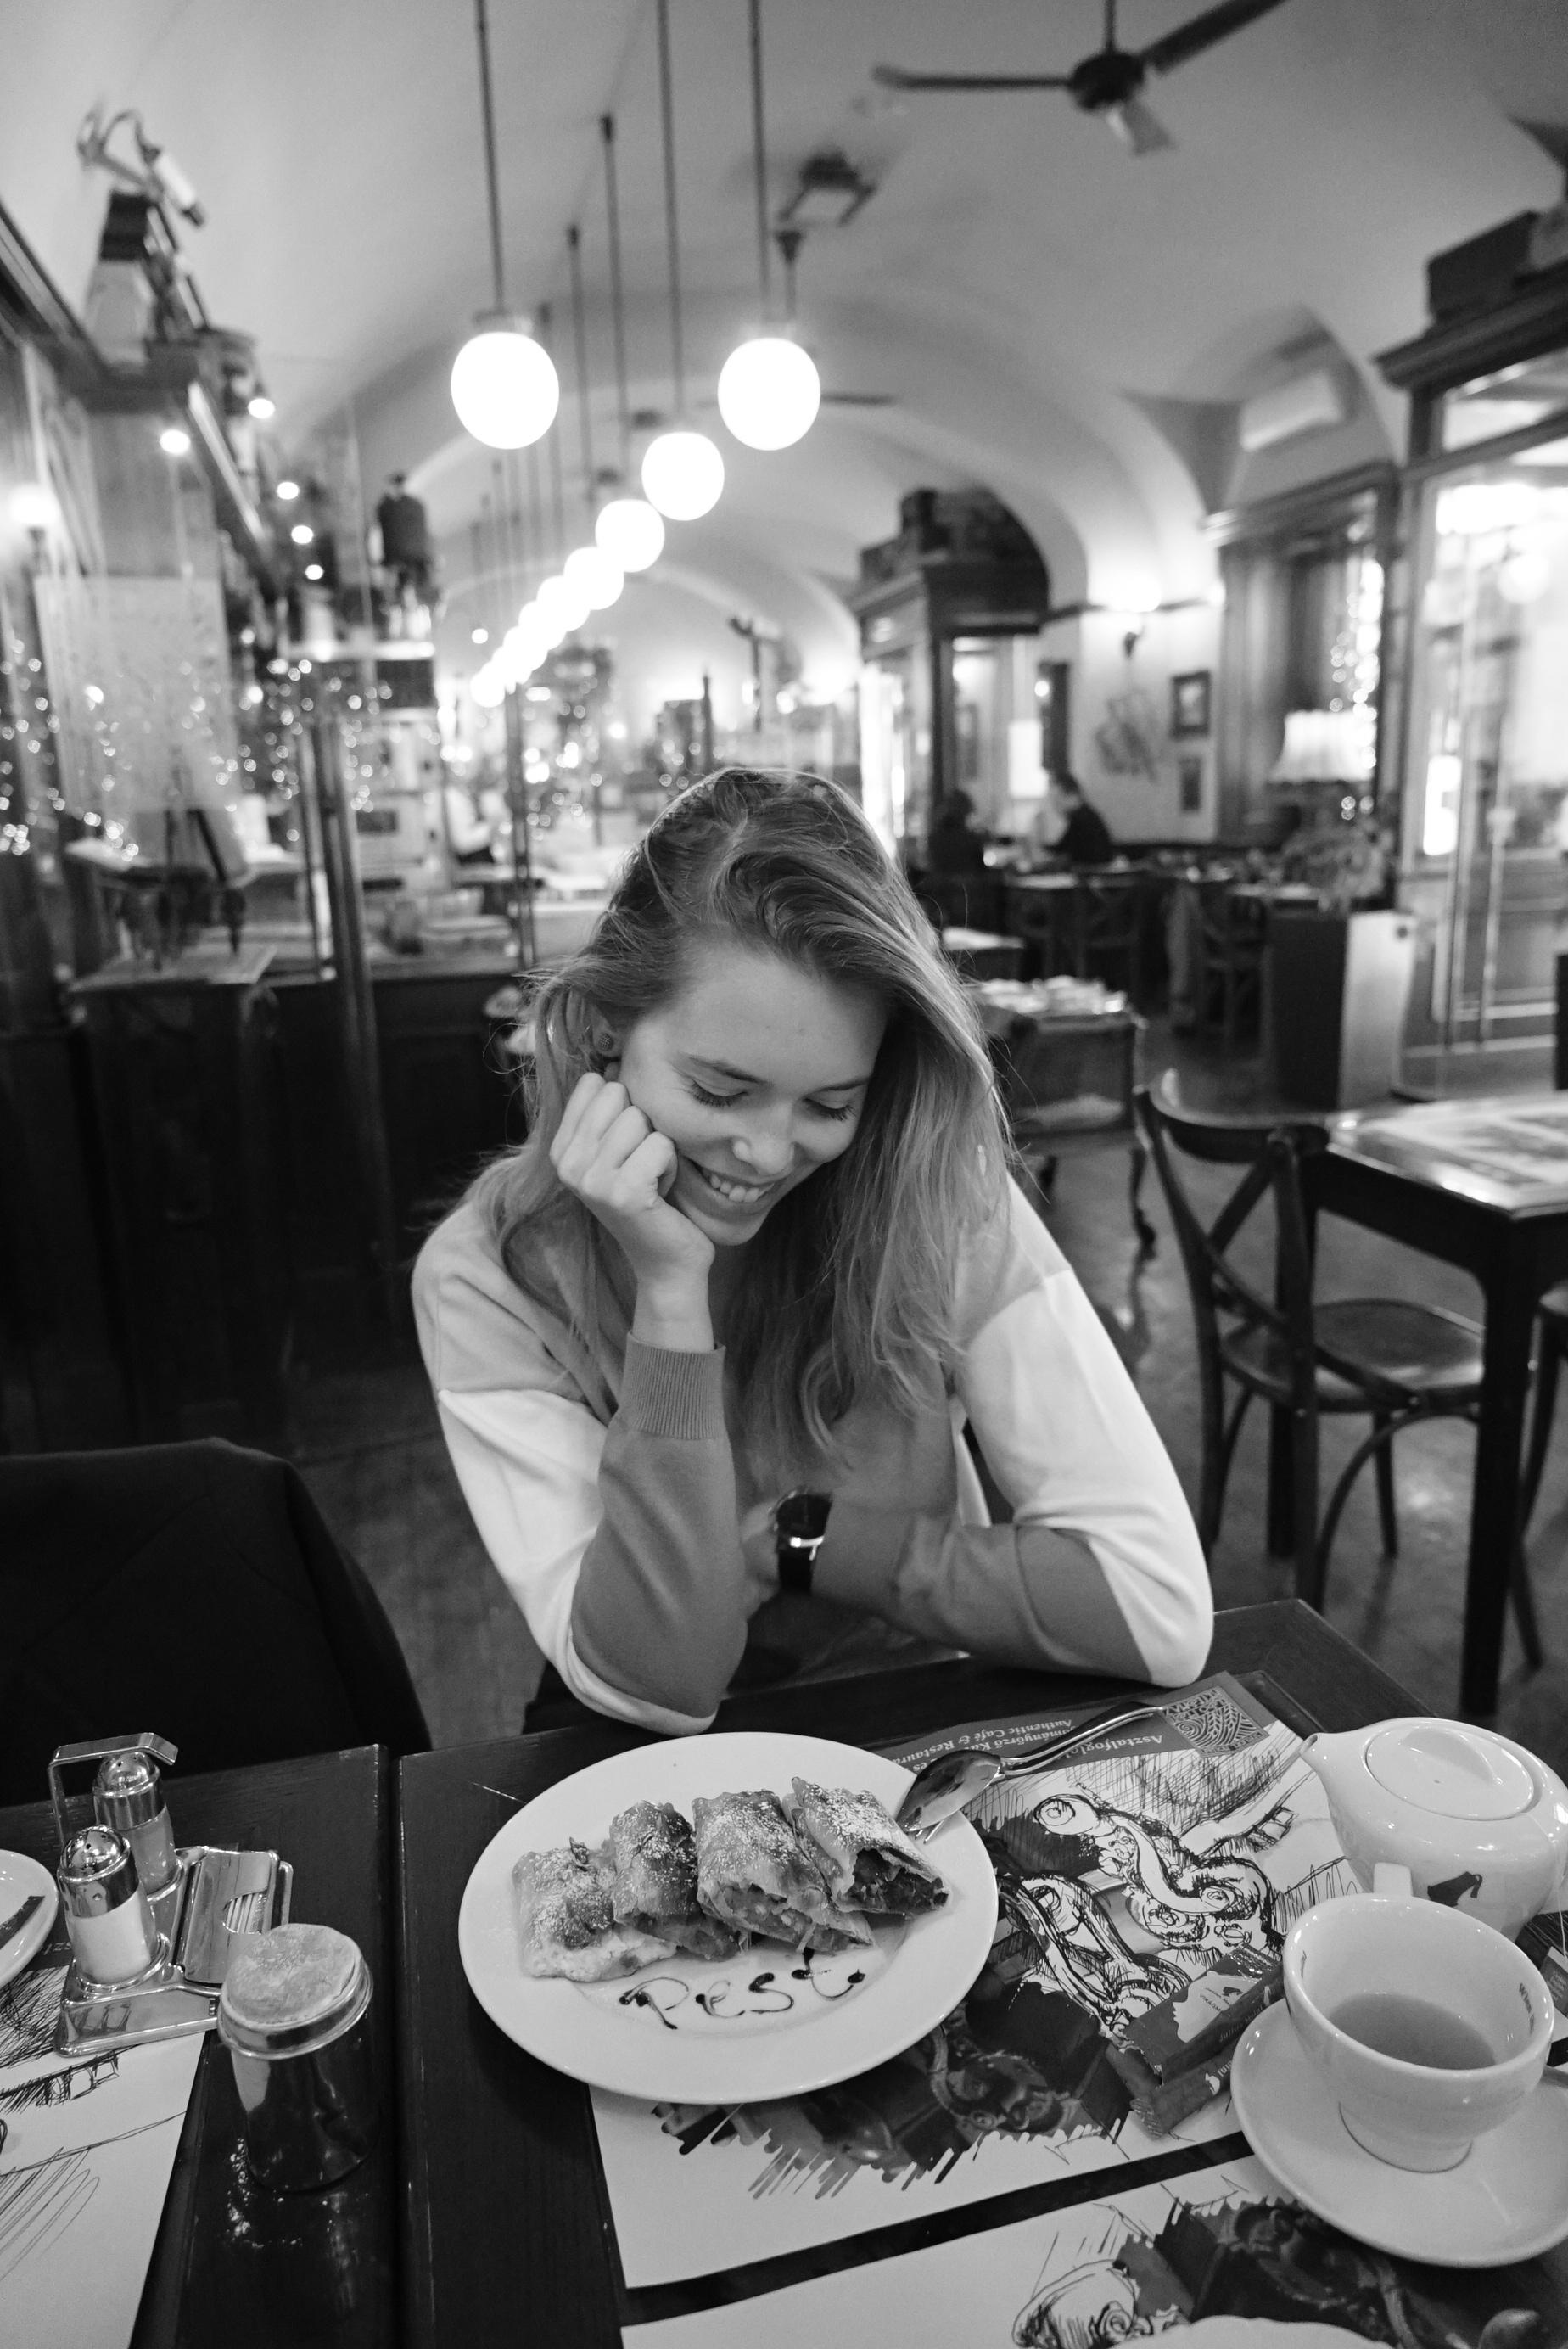 Girl eating strudel in Budapest cafe